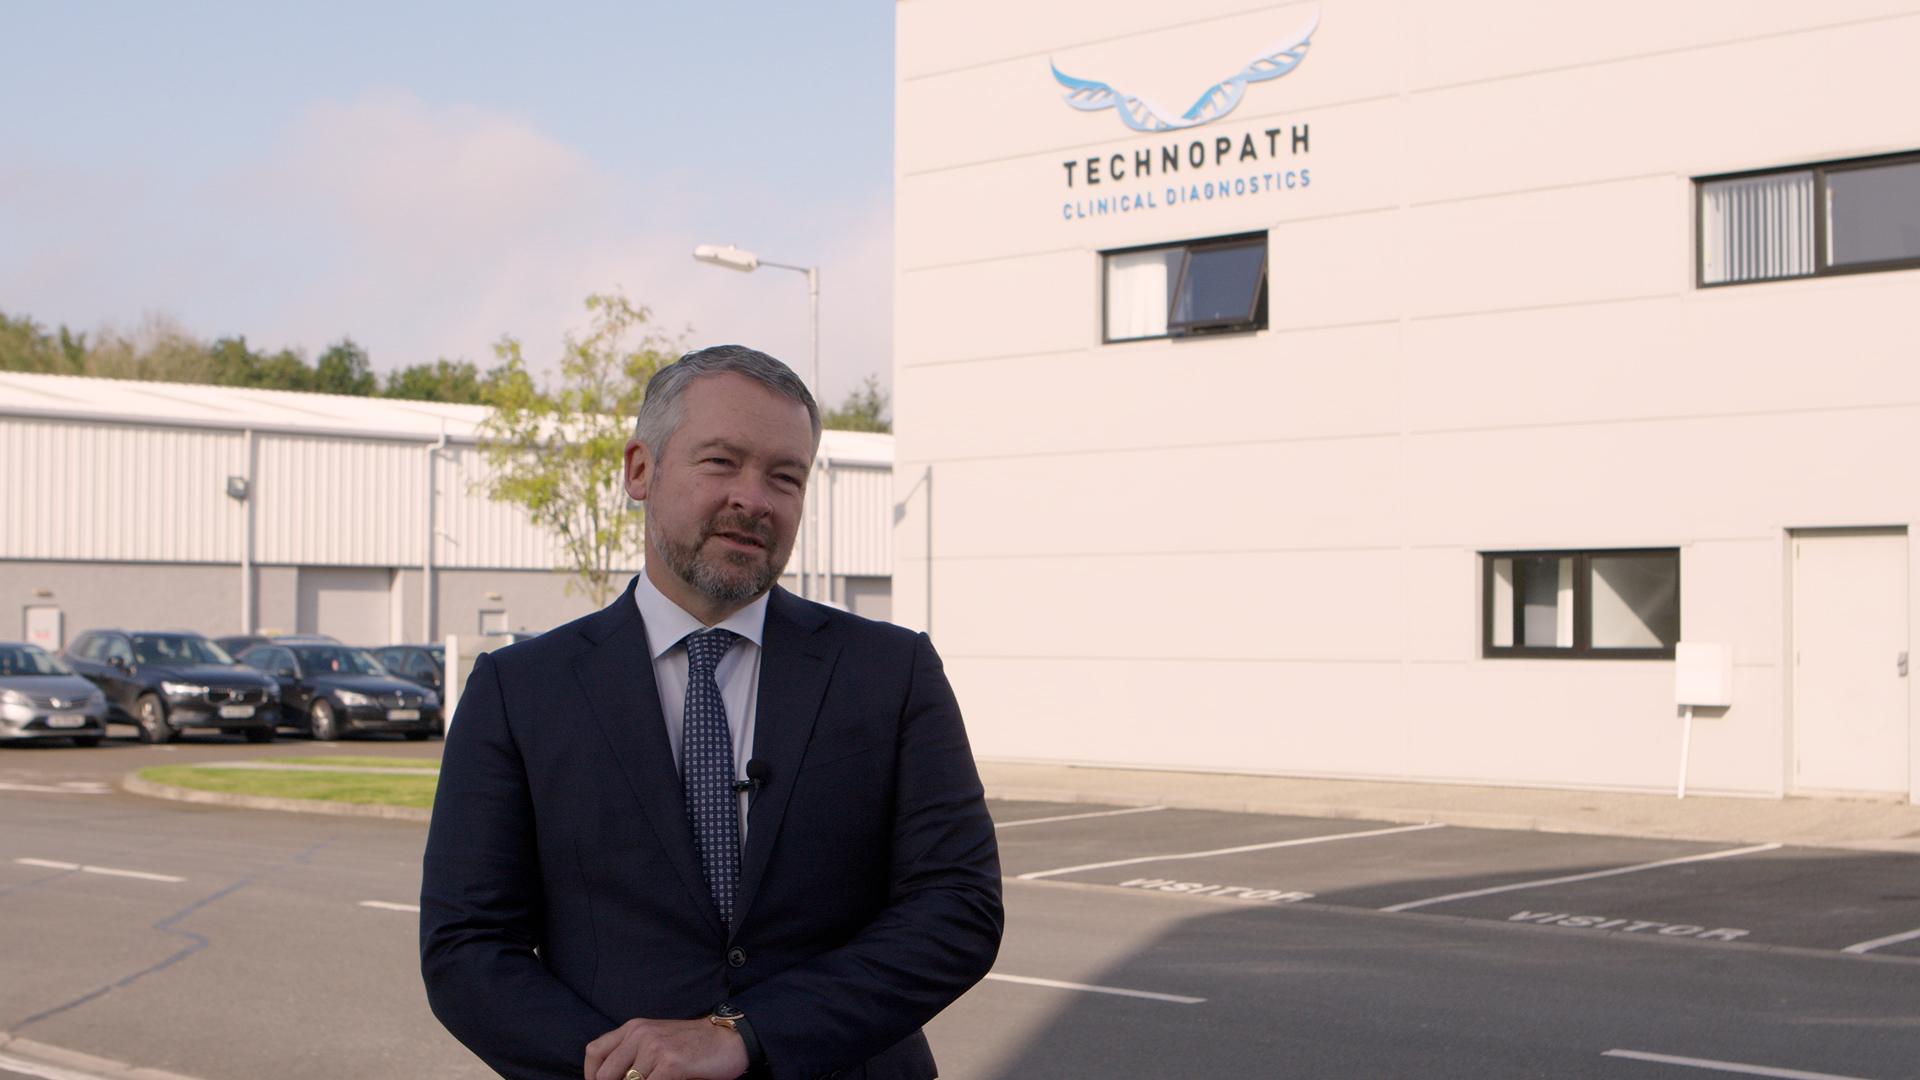 Malcolm Bell, CEO, Technopath